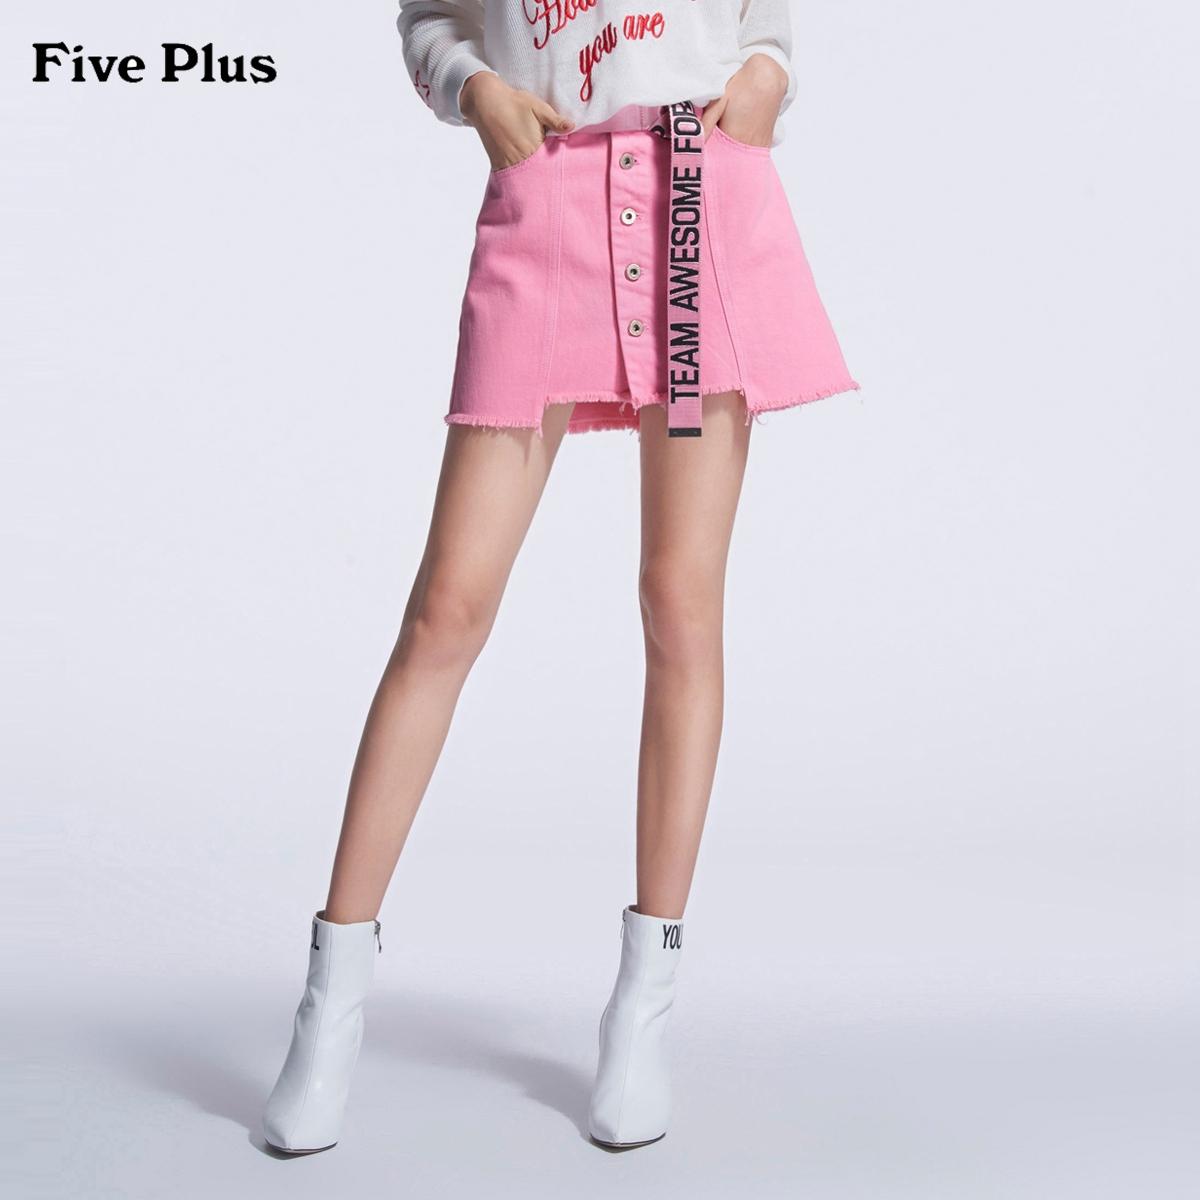 Five Plus2018新款女夏装牛仔A字裙不规则半身裙高腰毛边排扣纯棉